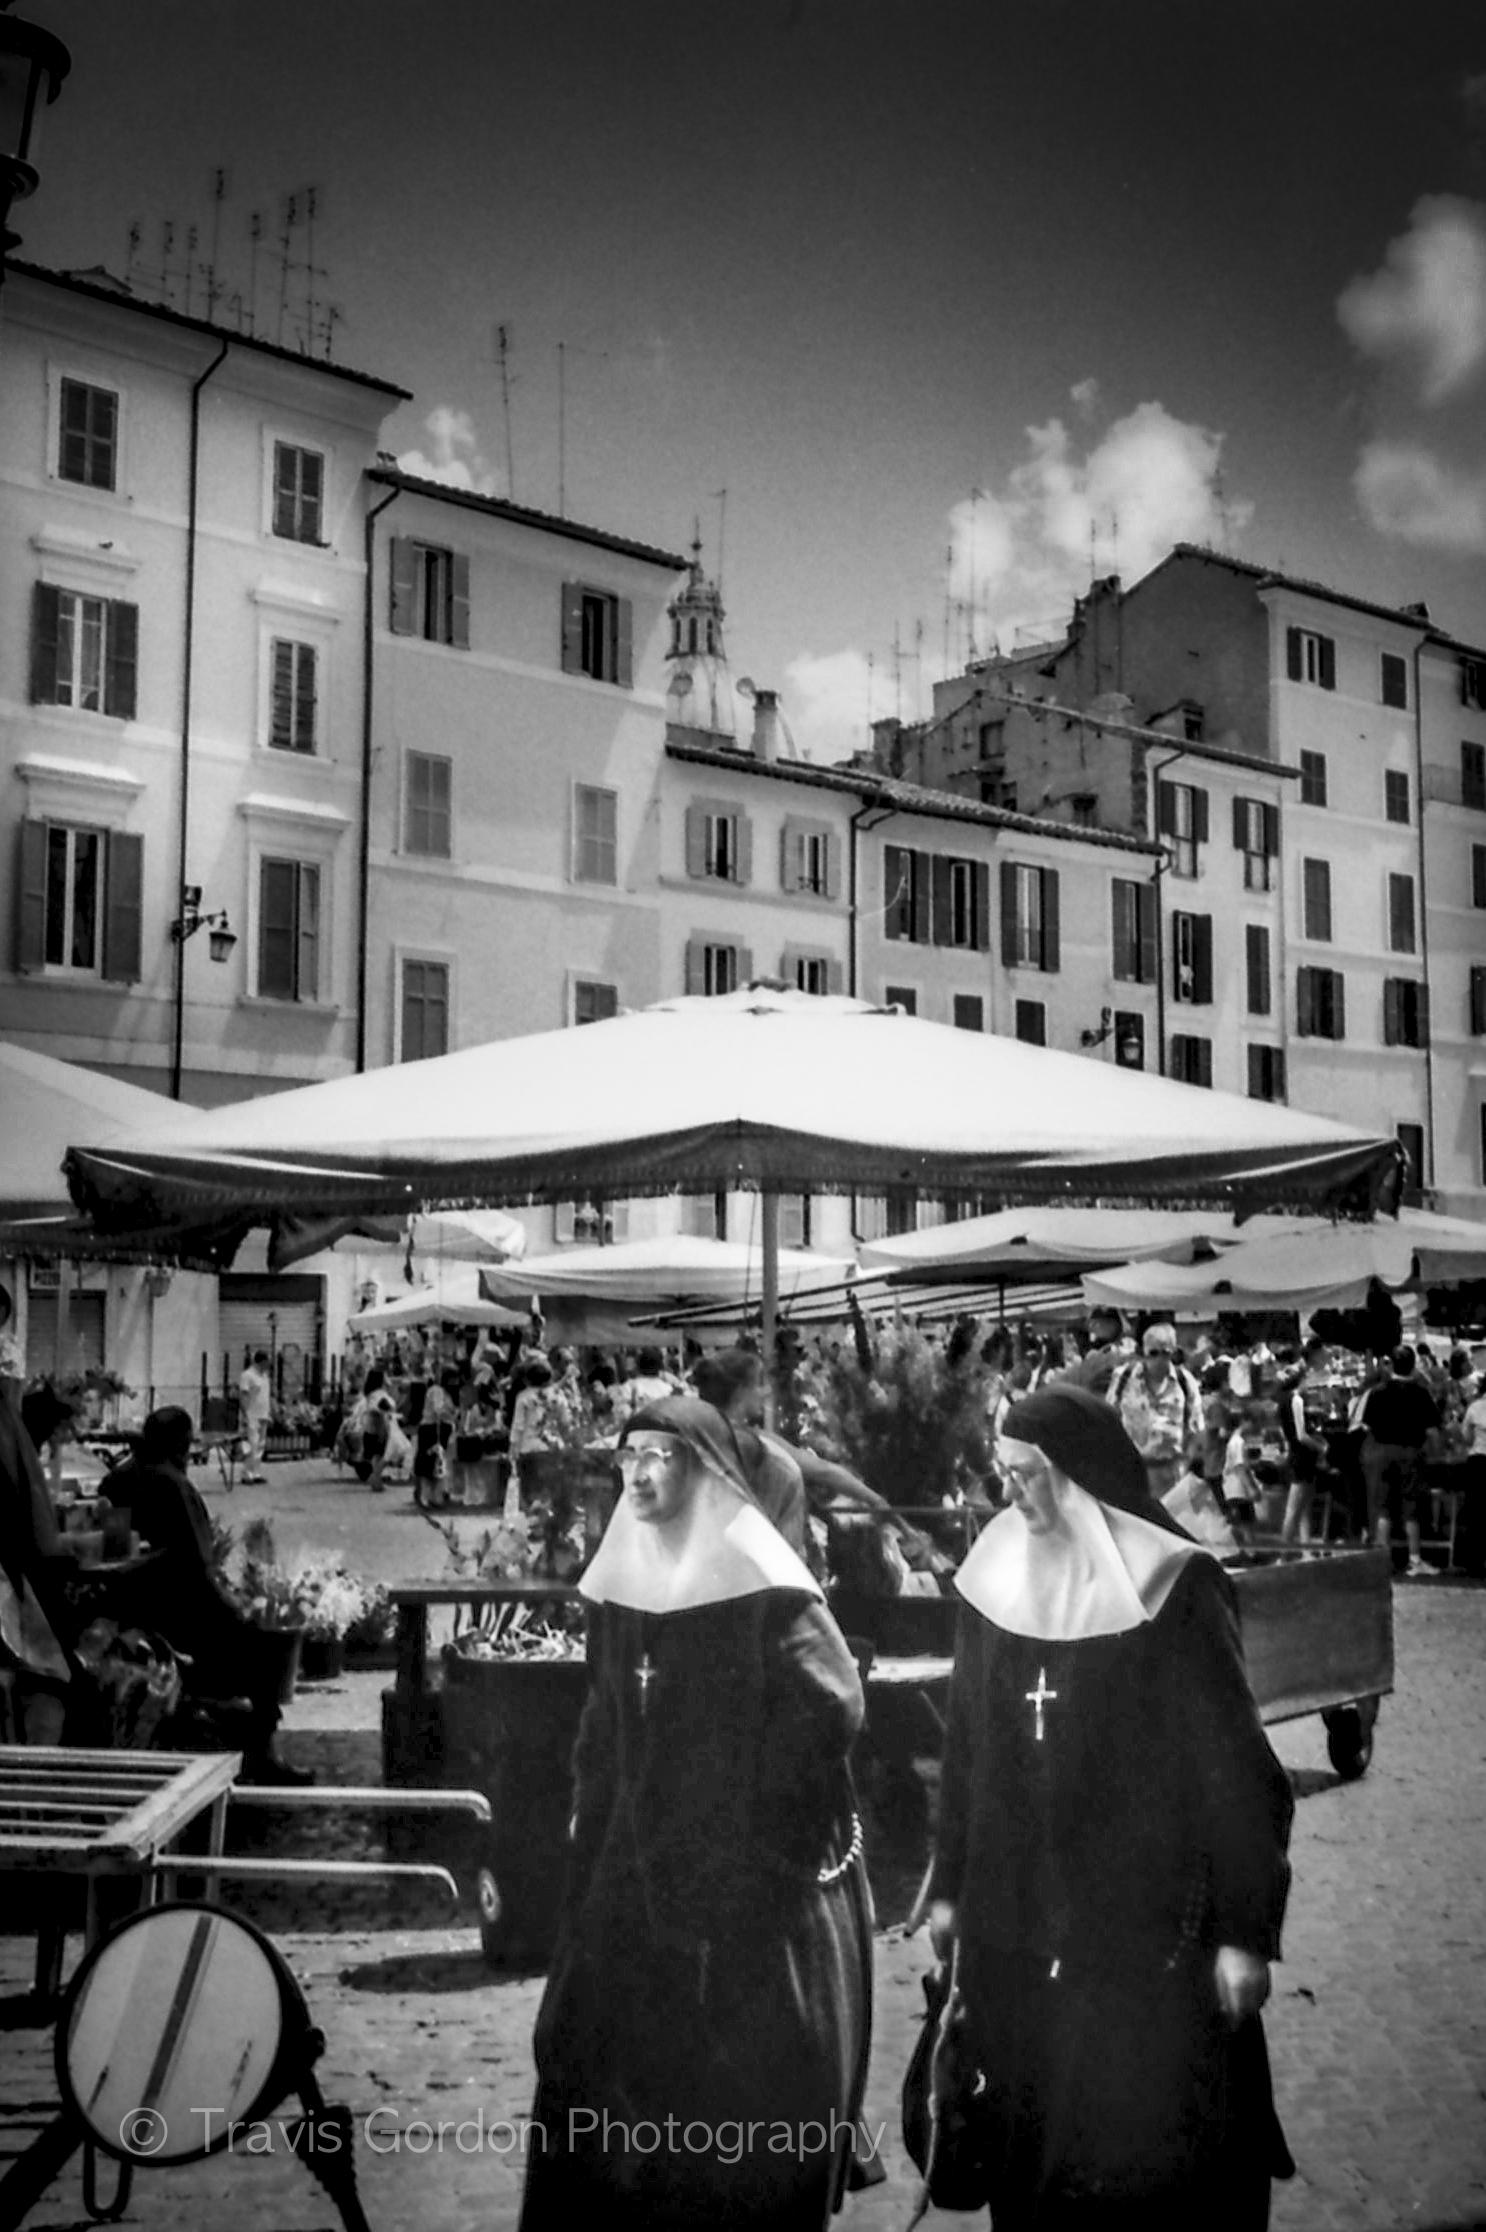 Two Nuns Walk Into a Market...